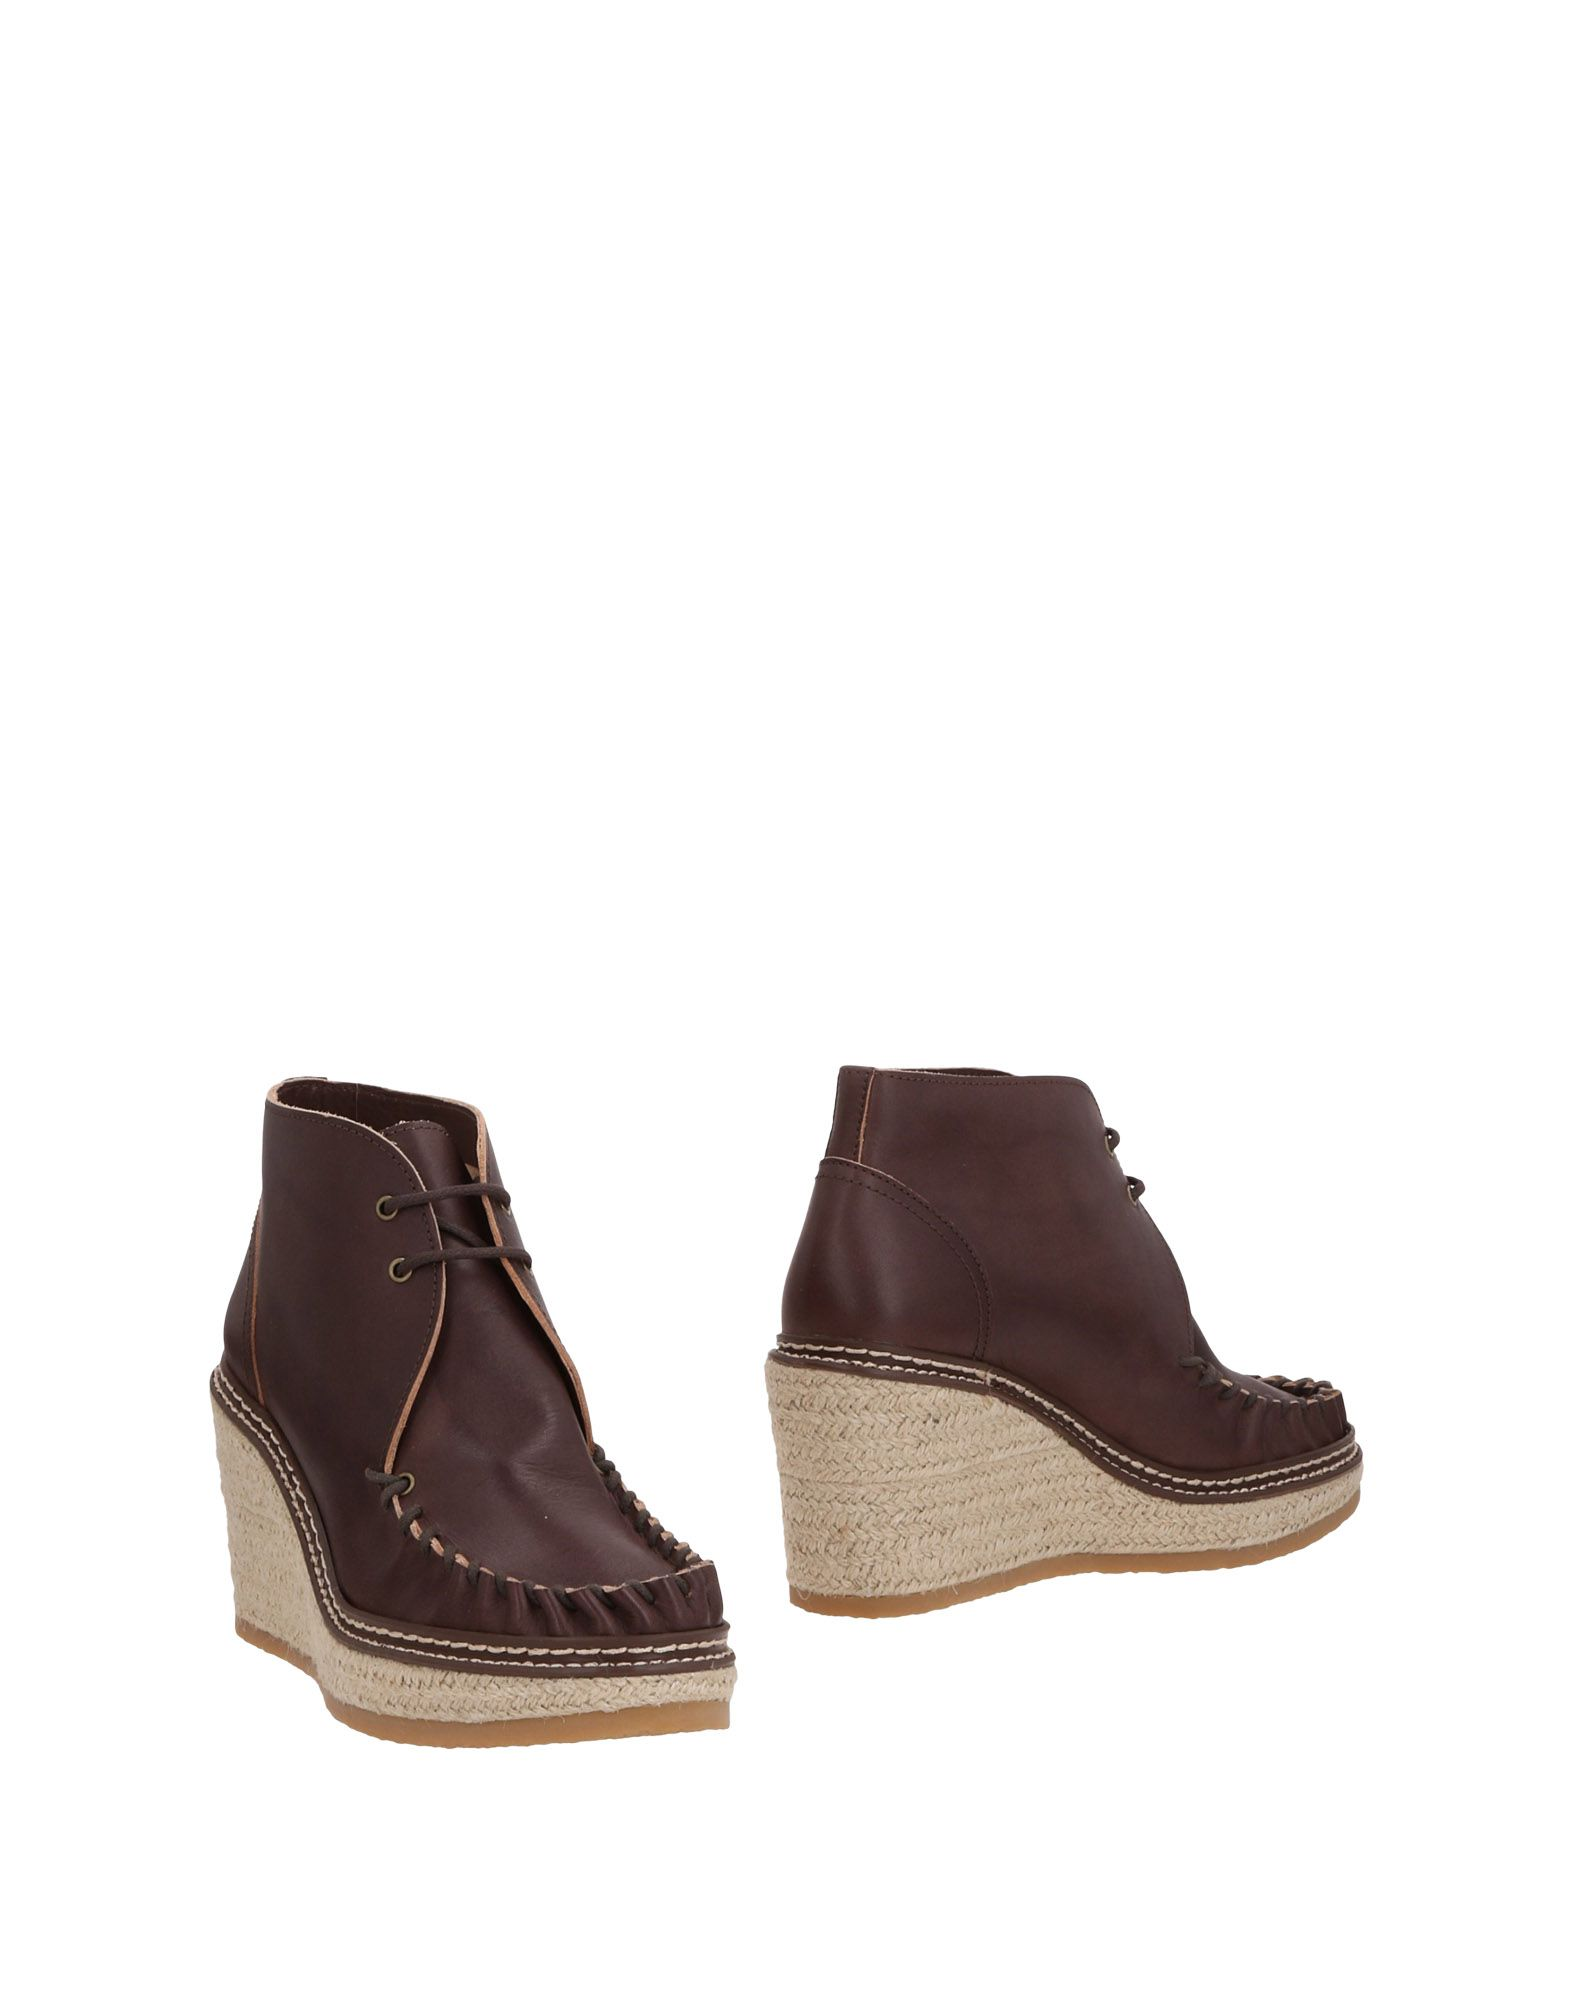 Rabatt Schuhe See By Chloé Stiefelette Damen  11462436SD